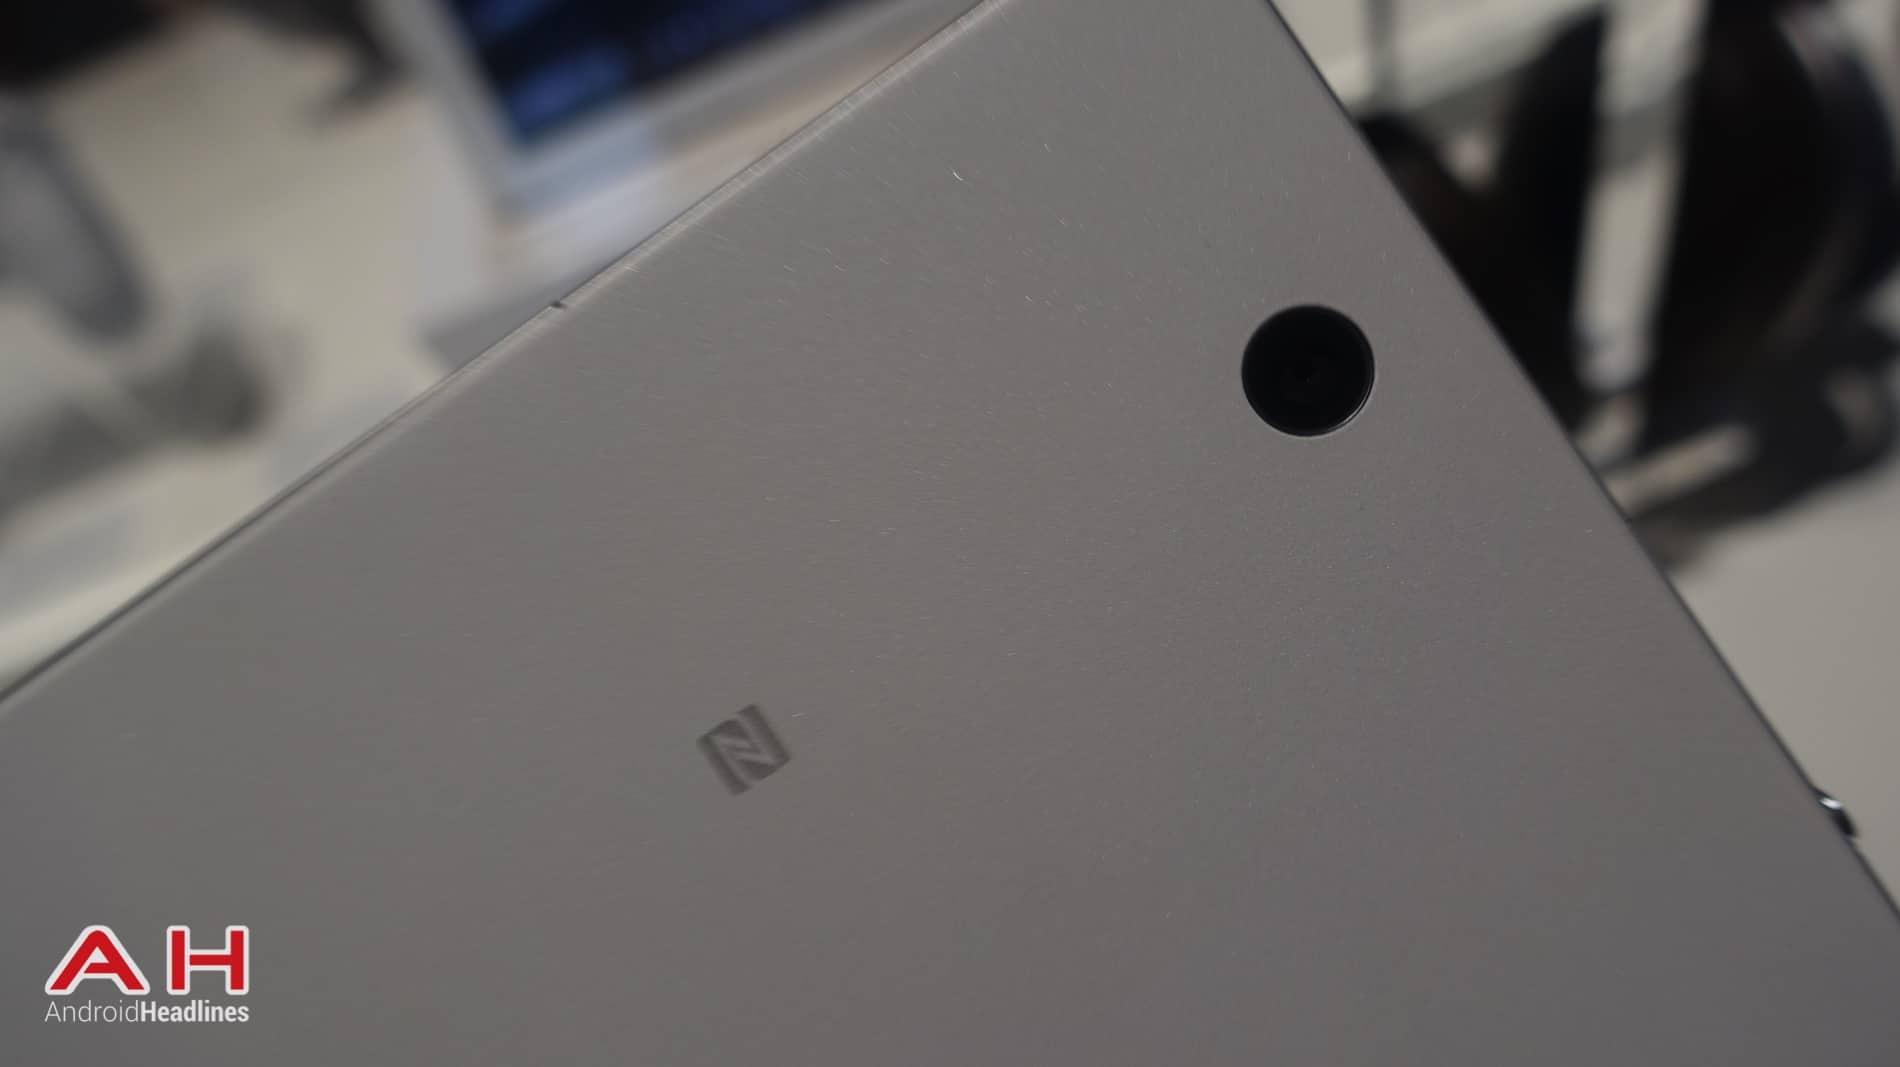 Sony Xperia Z4 Tablet AH 08